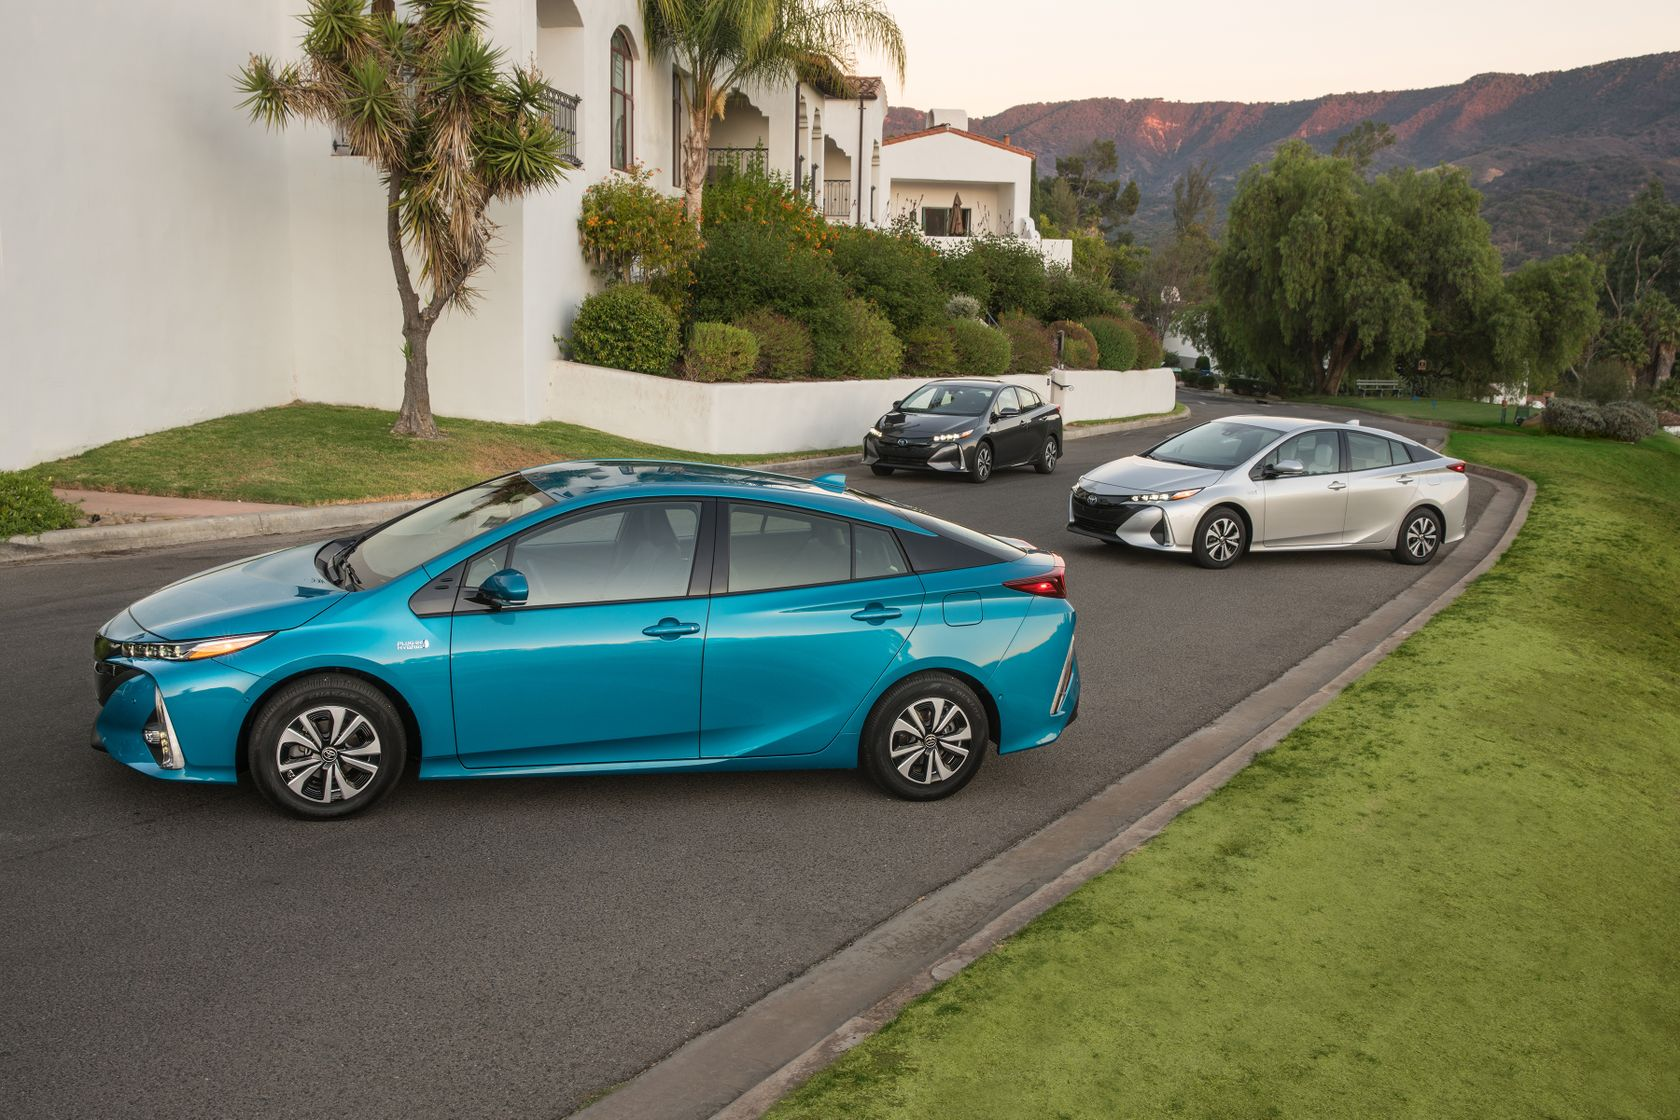 2017 Toyota Prius PrimeF amily